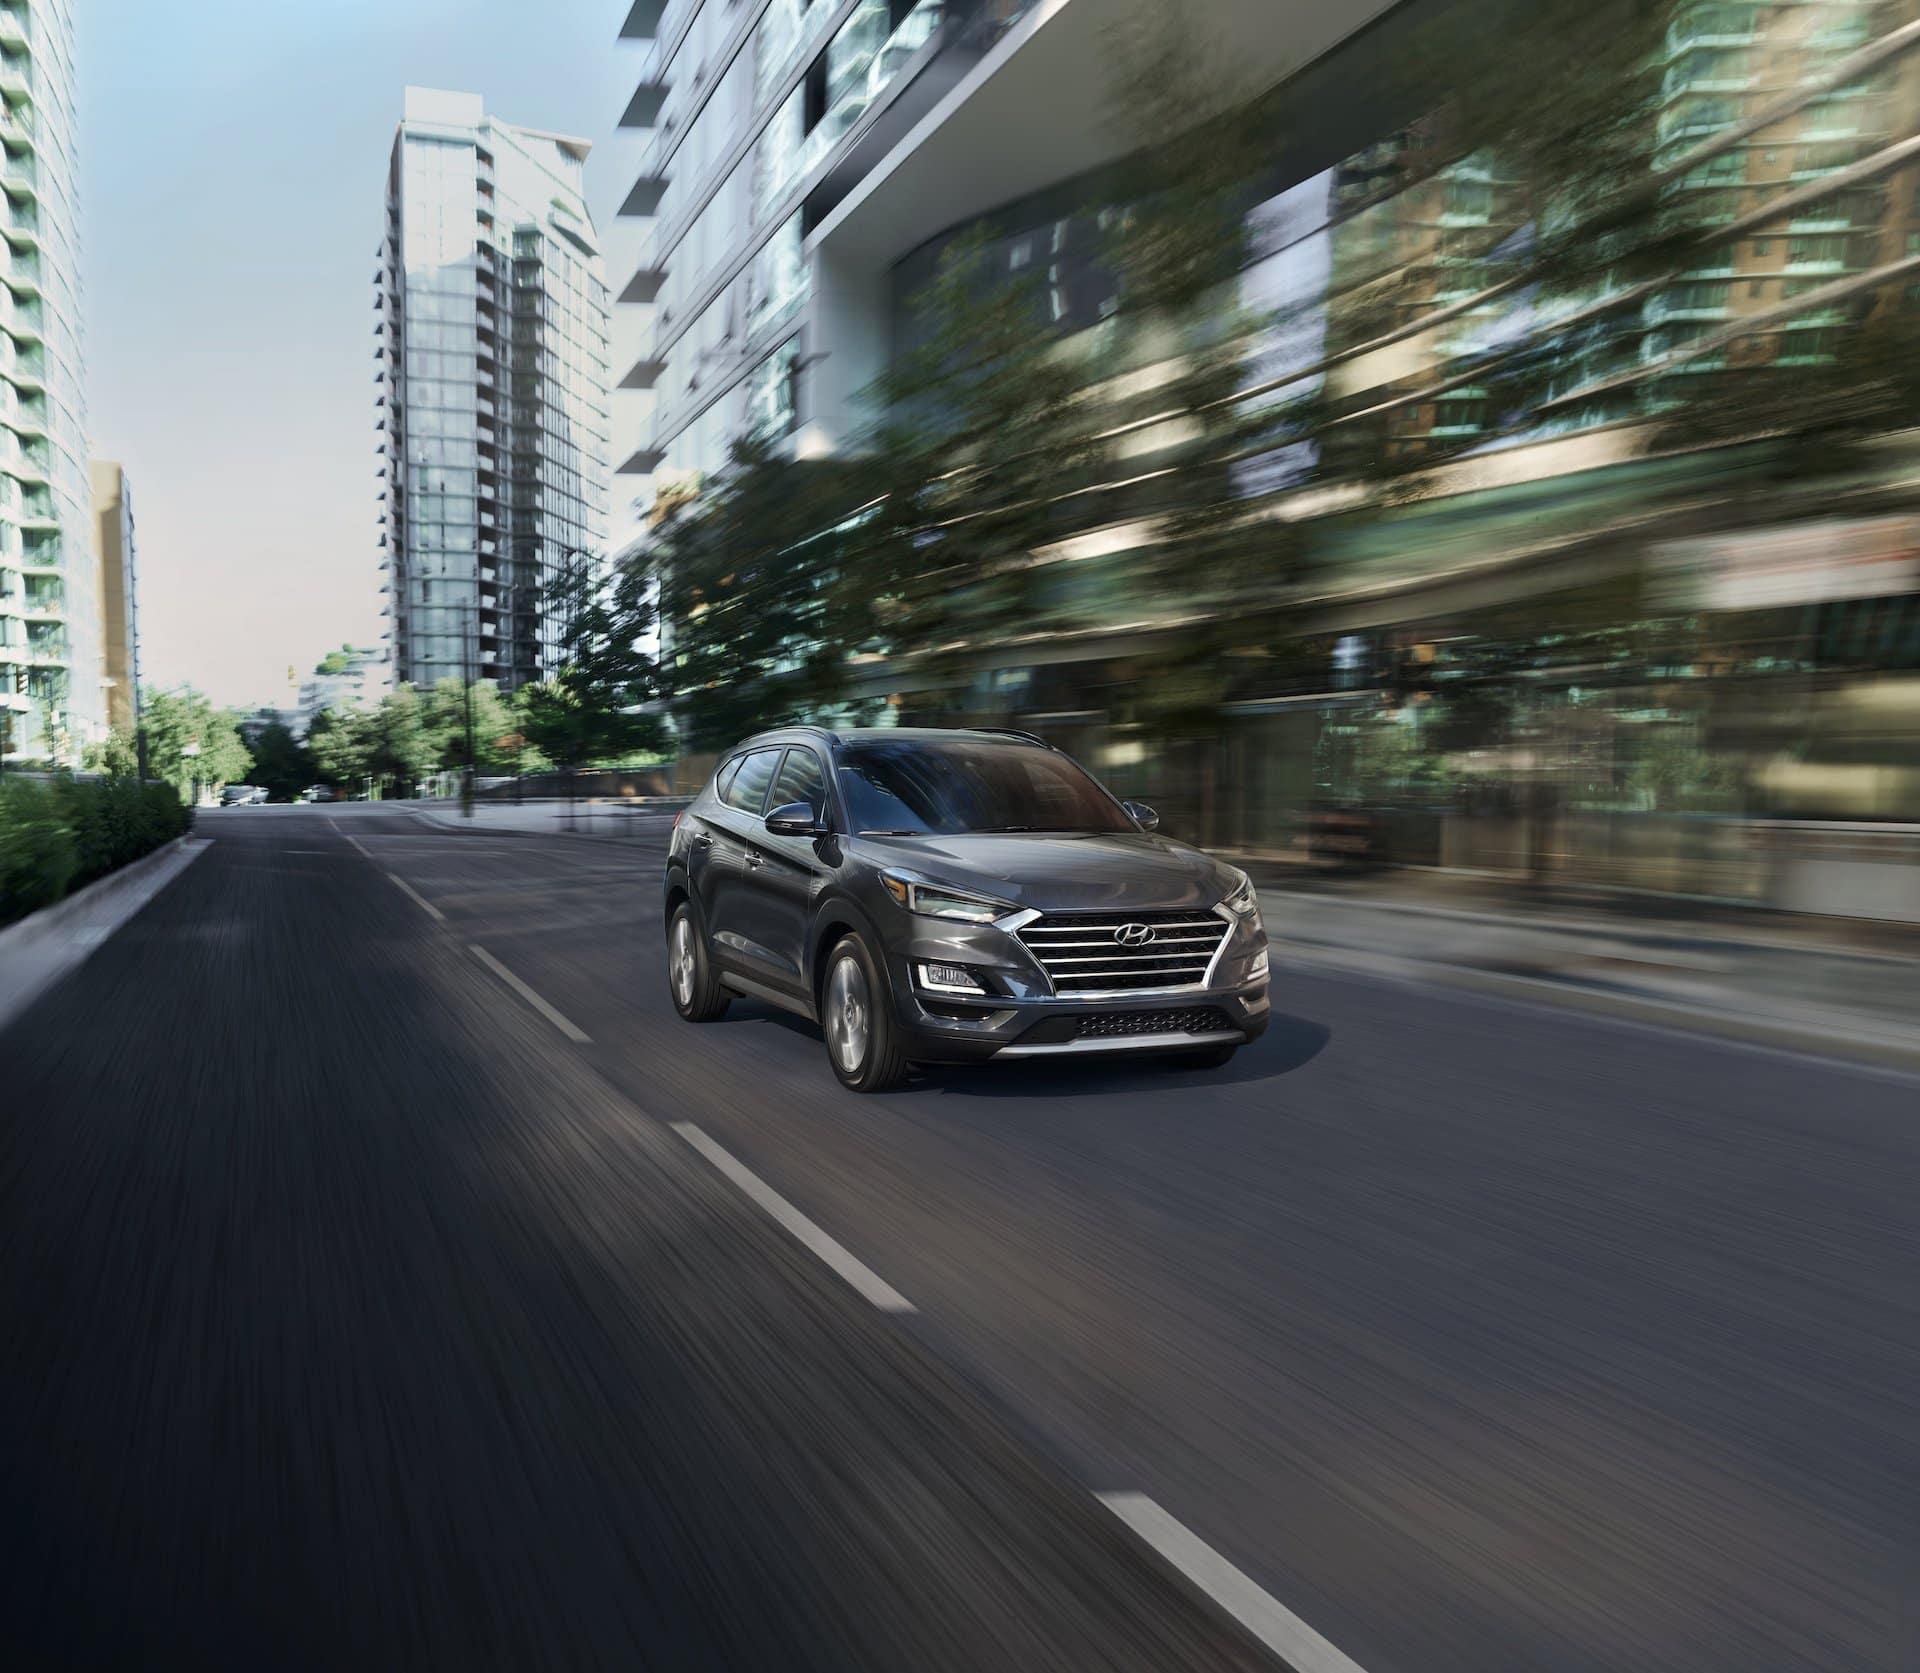 Washington Hyundai is a Hyundai Dealership in Washington near McGovern, PA | Hyundai Tucson driving fast through city